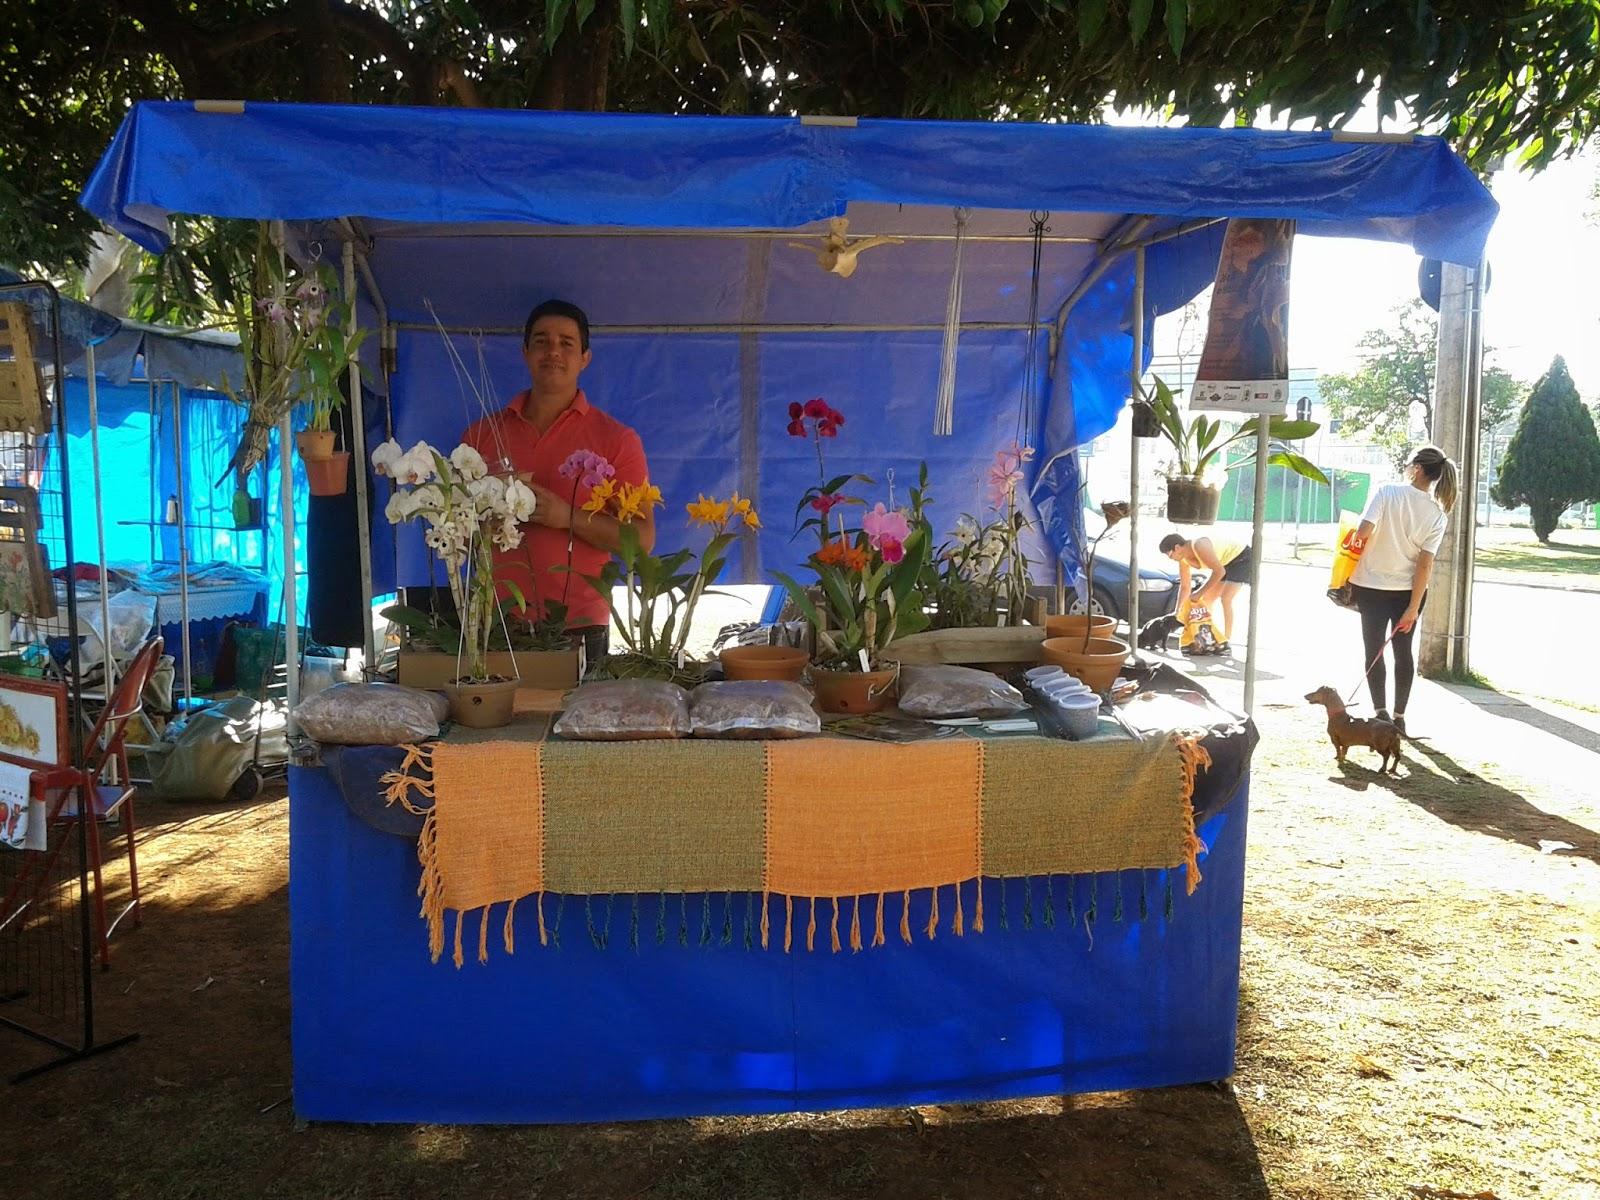 Aparador Blanco Barato ~ feira de artesanato em Sorocaba FELTRO ORQUIDEAS